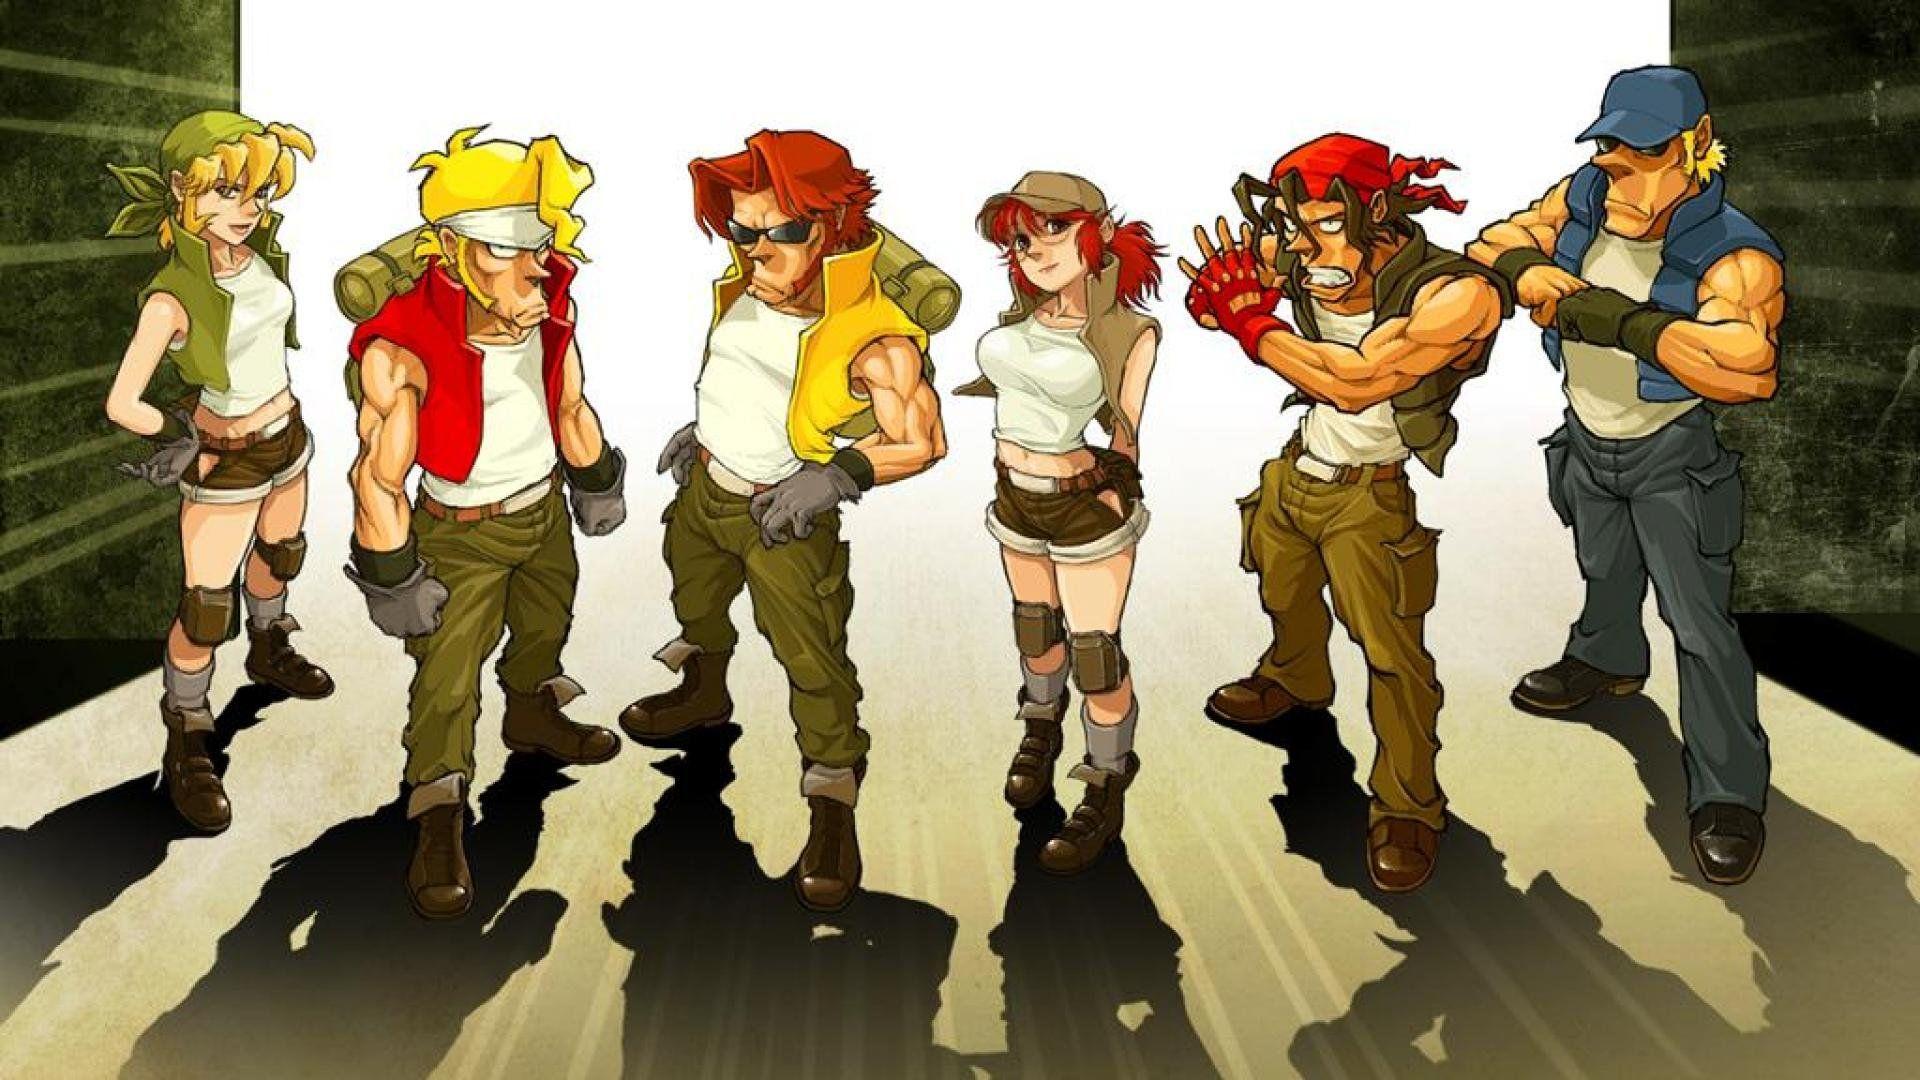 Metal Slug Wallpapers Wallpaper Cave Anime Retro Gaming Art Game Character Design